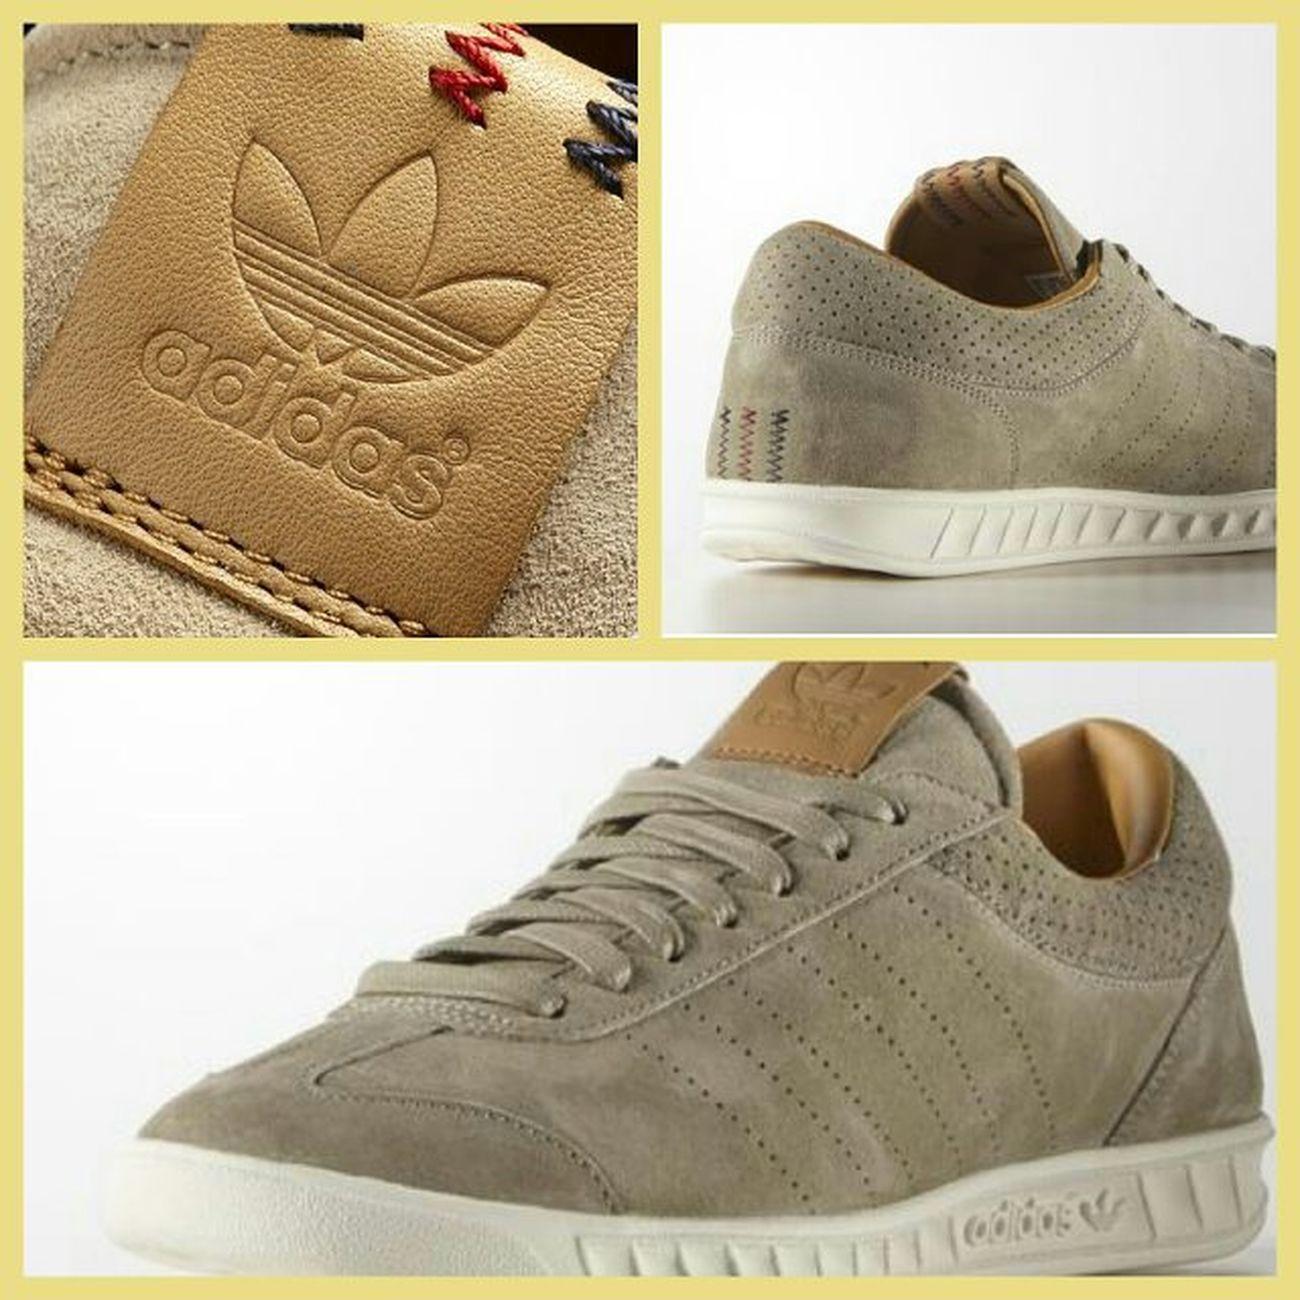 Online now Adidashamburgfreizeit @adidas.com.. thoughts?!